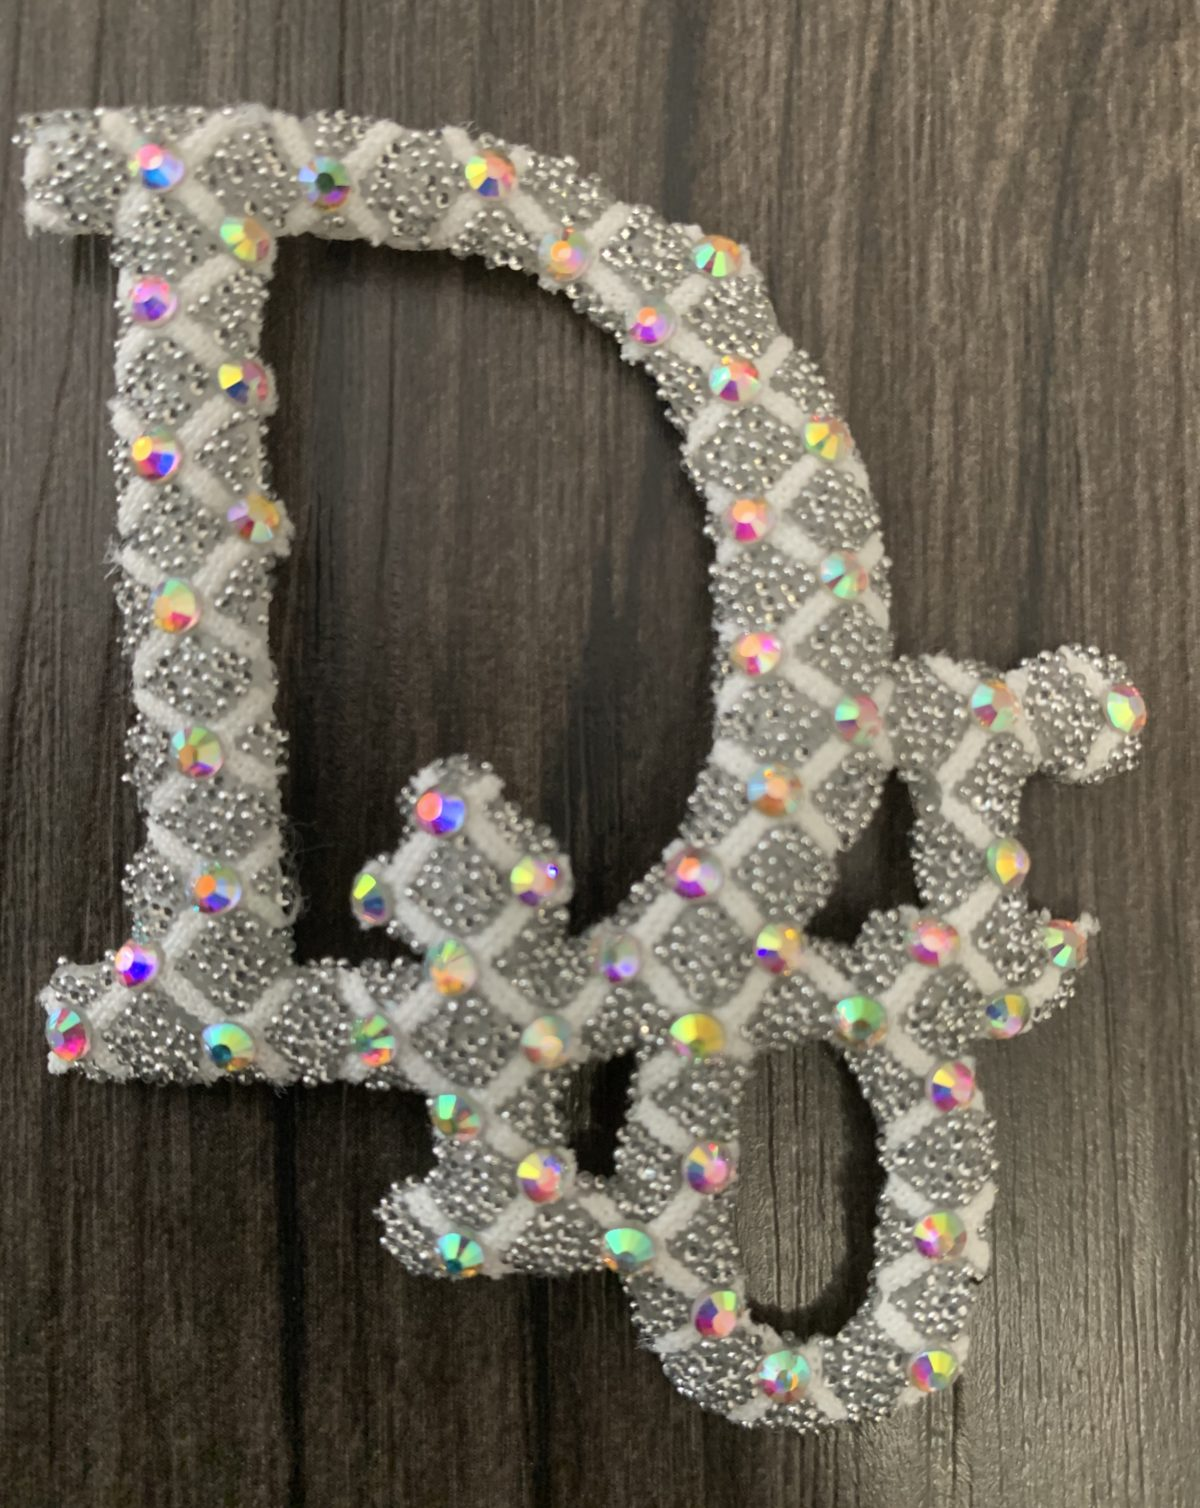 New Dior Rhinestone Iron on Emblem Patch 1